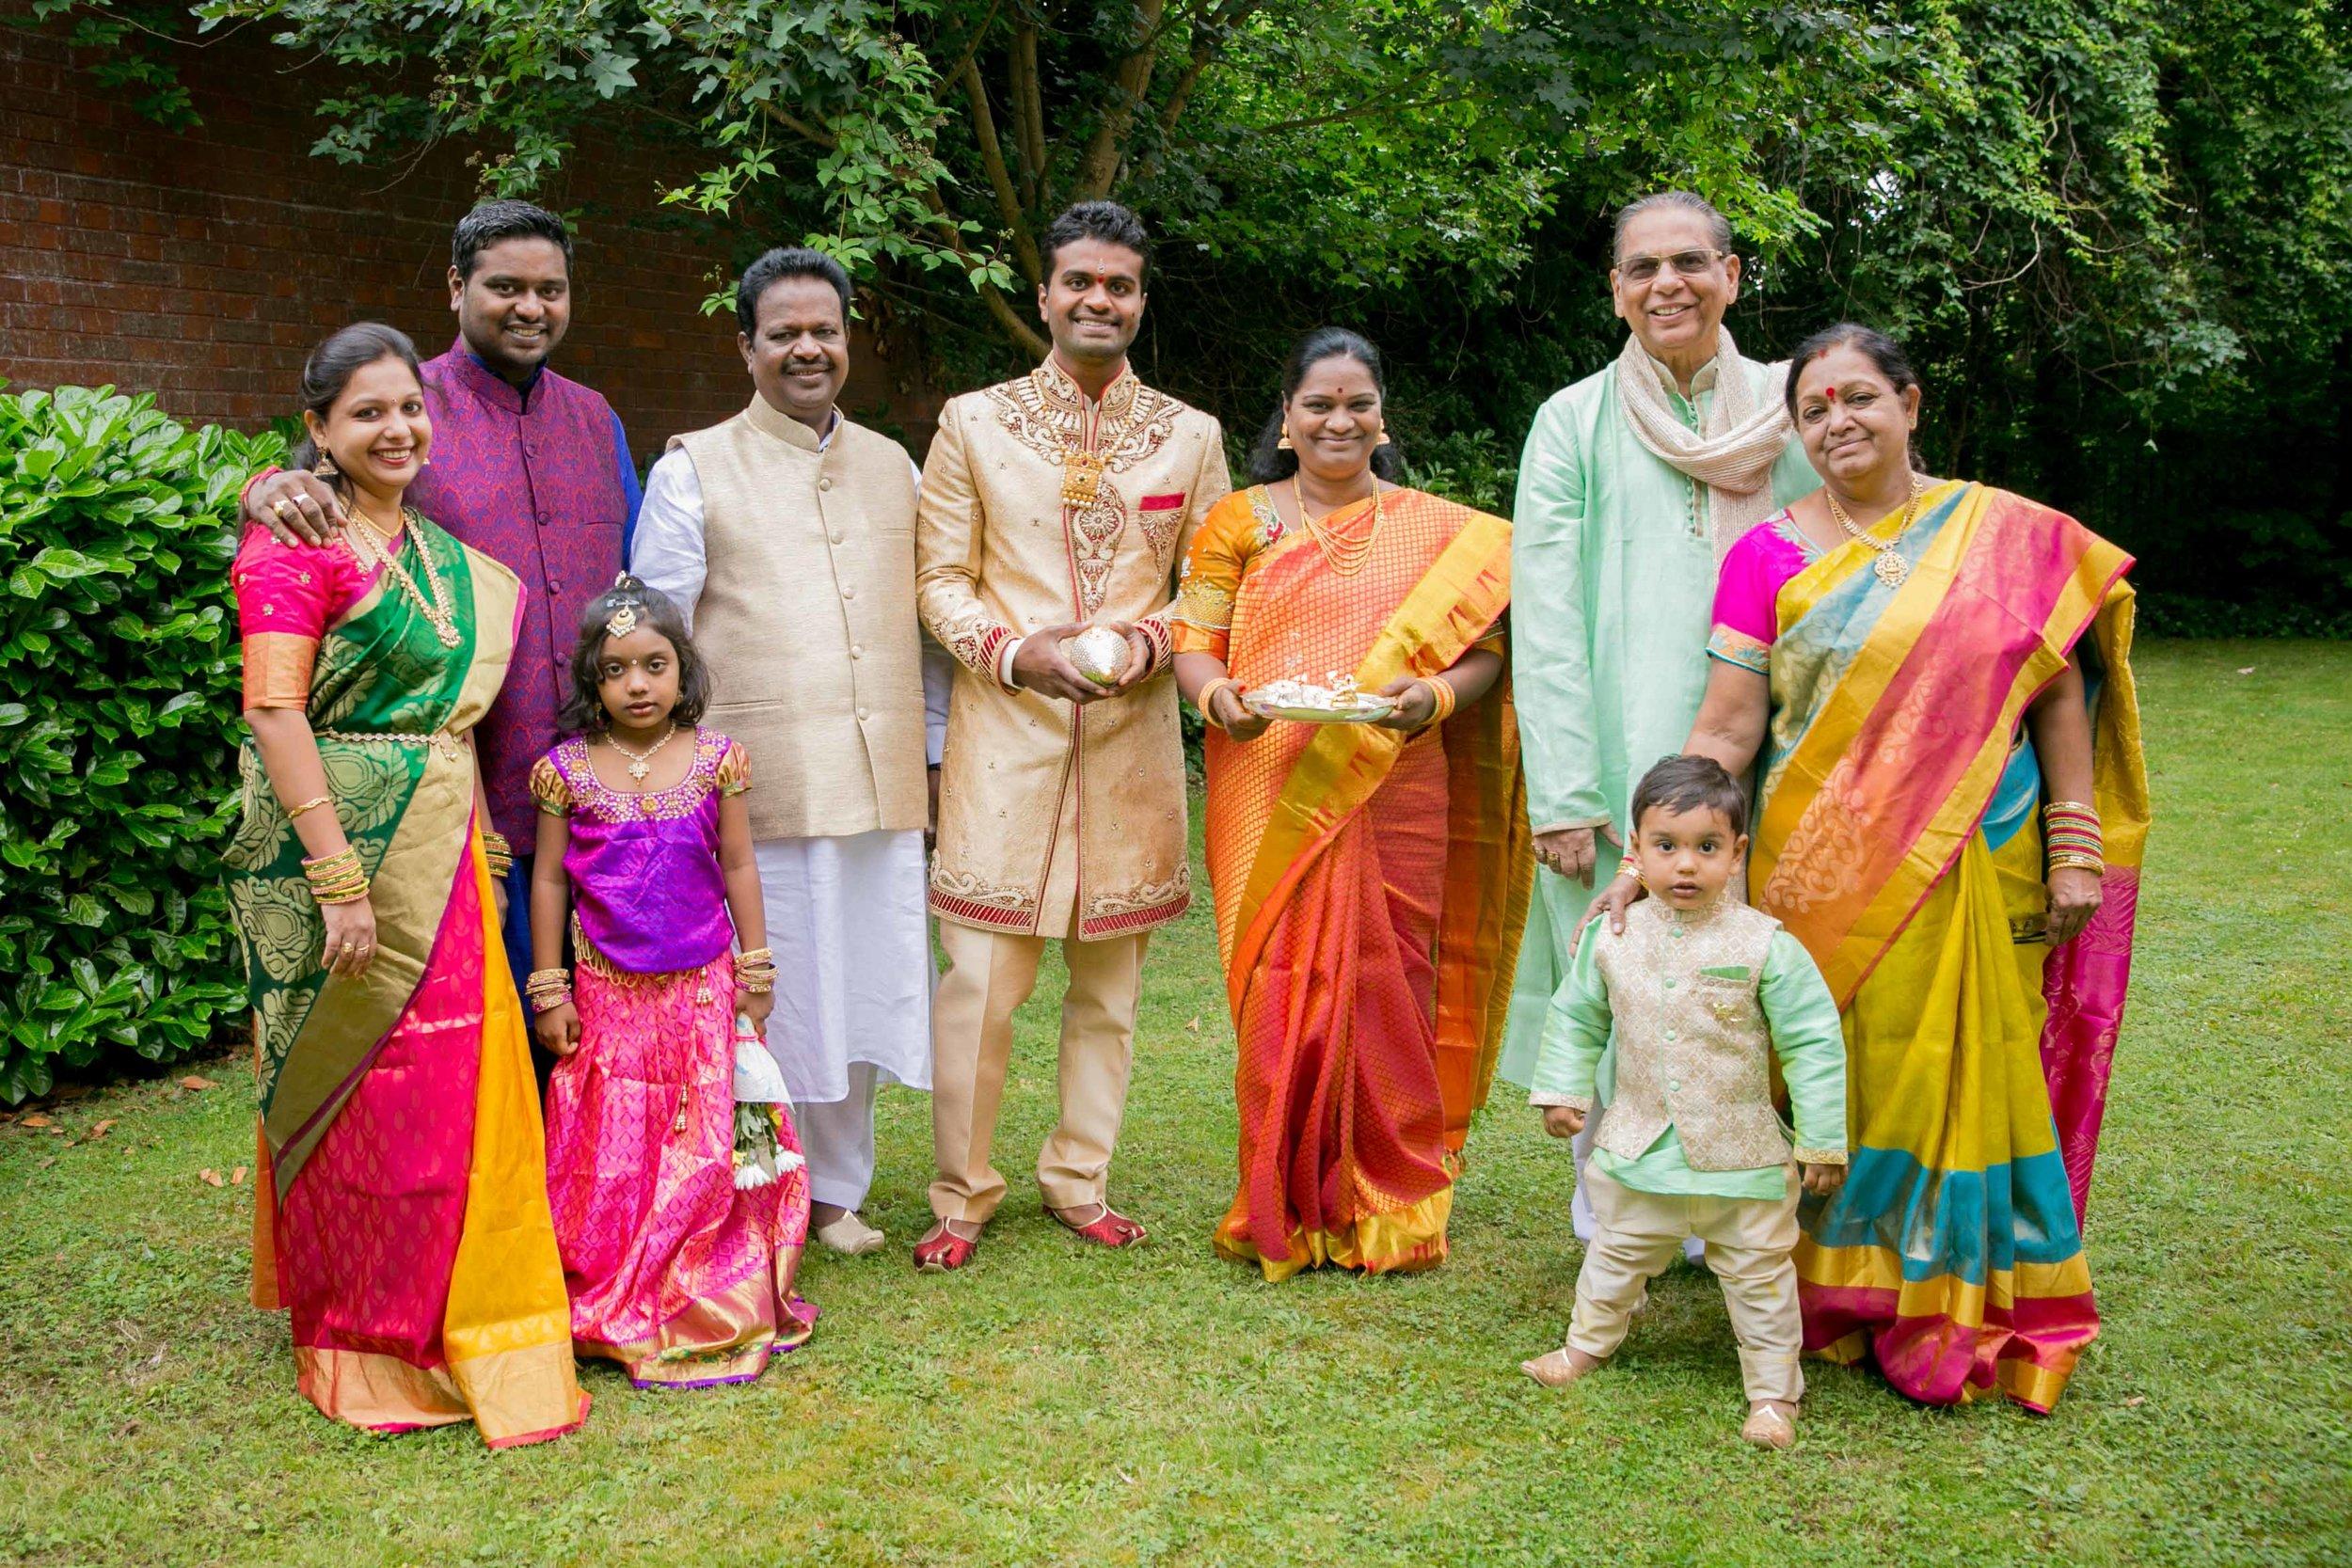 premier-banquetting-london-Hindu-asian-wedding-photographer-natalia-smith-photography-4.jpg